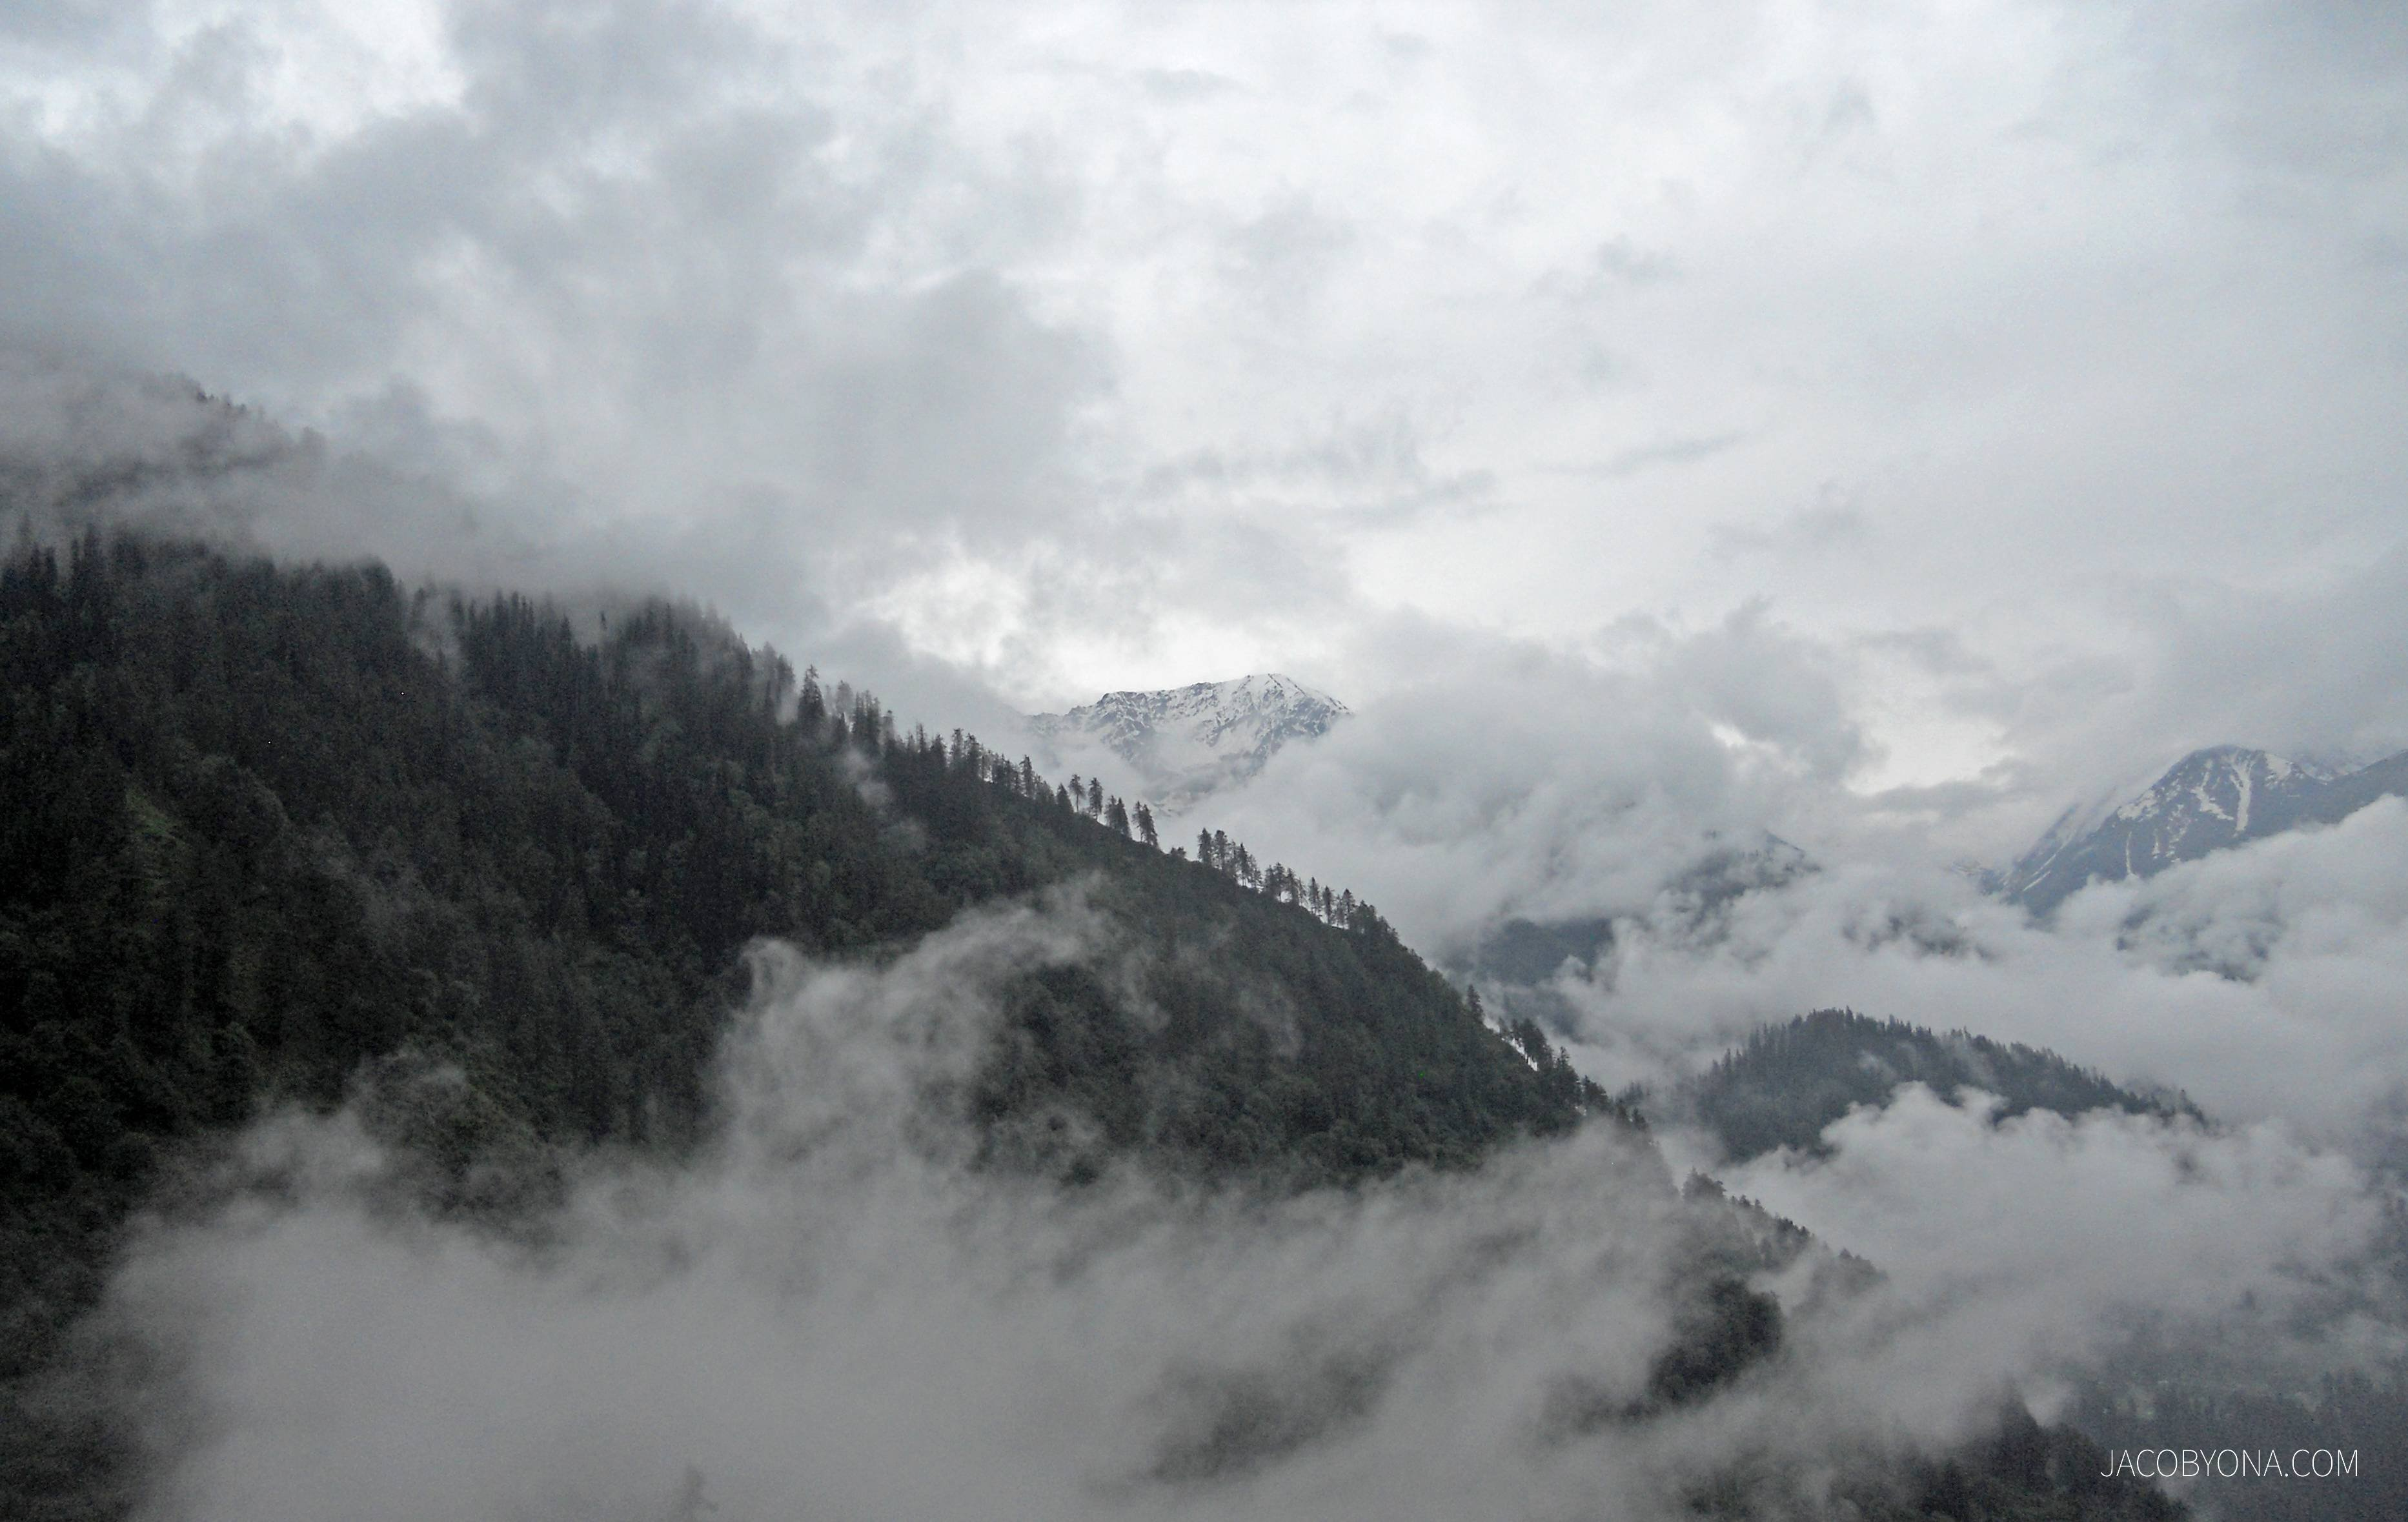 Hd Wall Of Humachal: Tosh Himachal Pradesh India HD Wallpaper